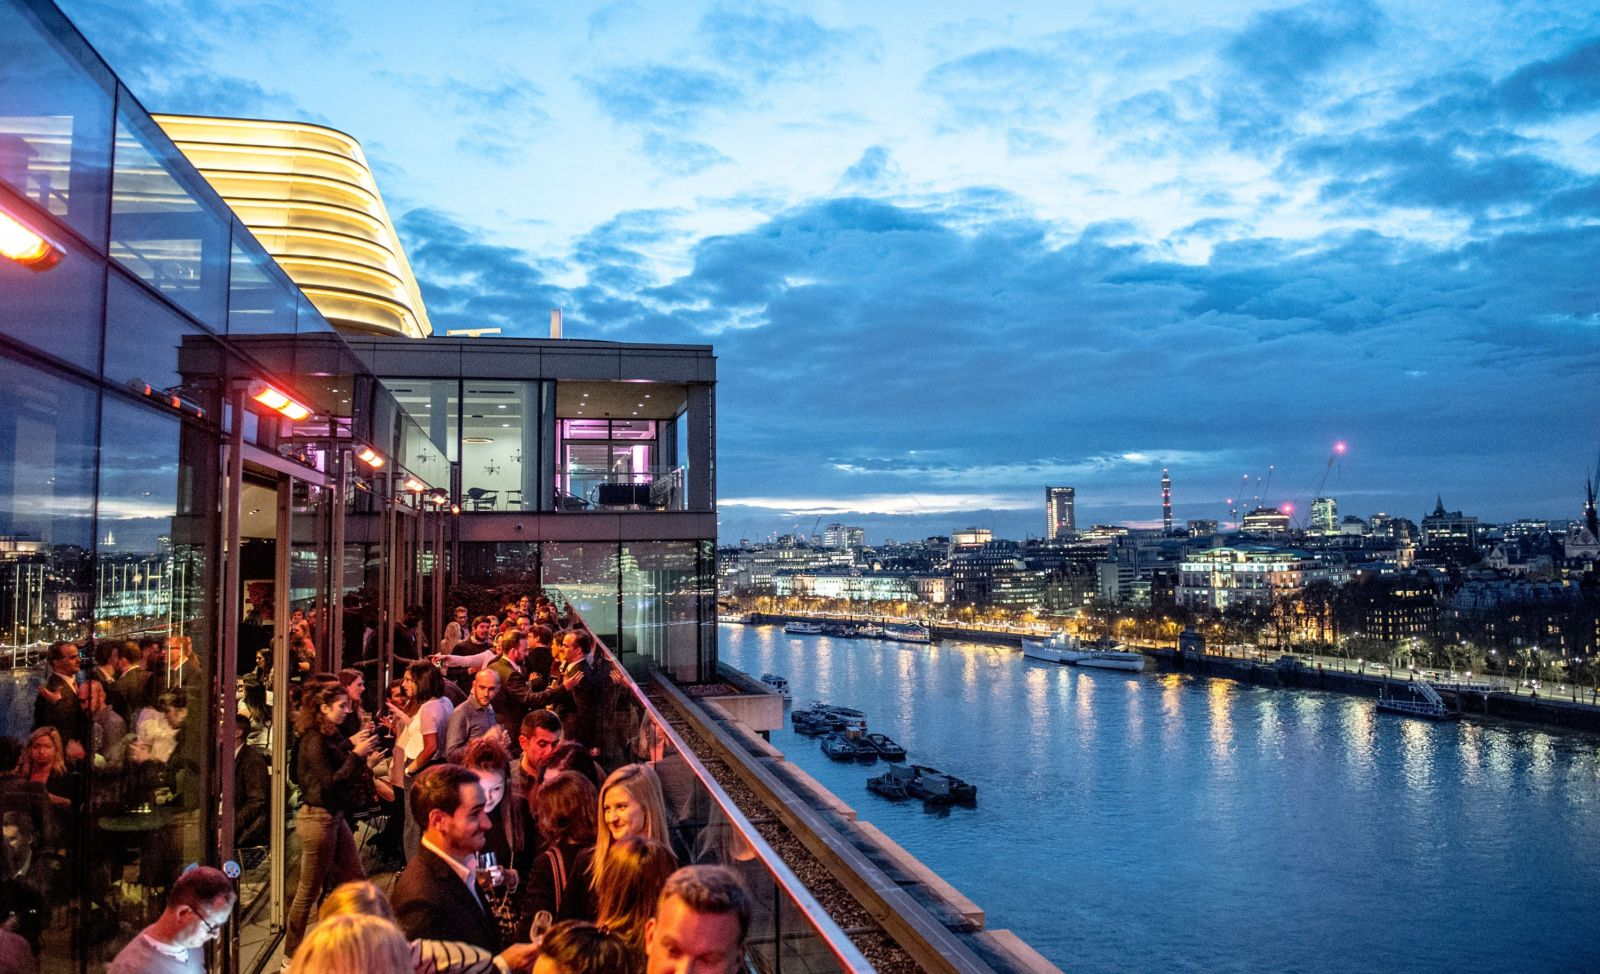 Best Rooftop Bars In London - JULIET ANGUS